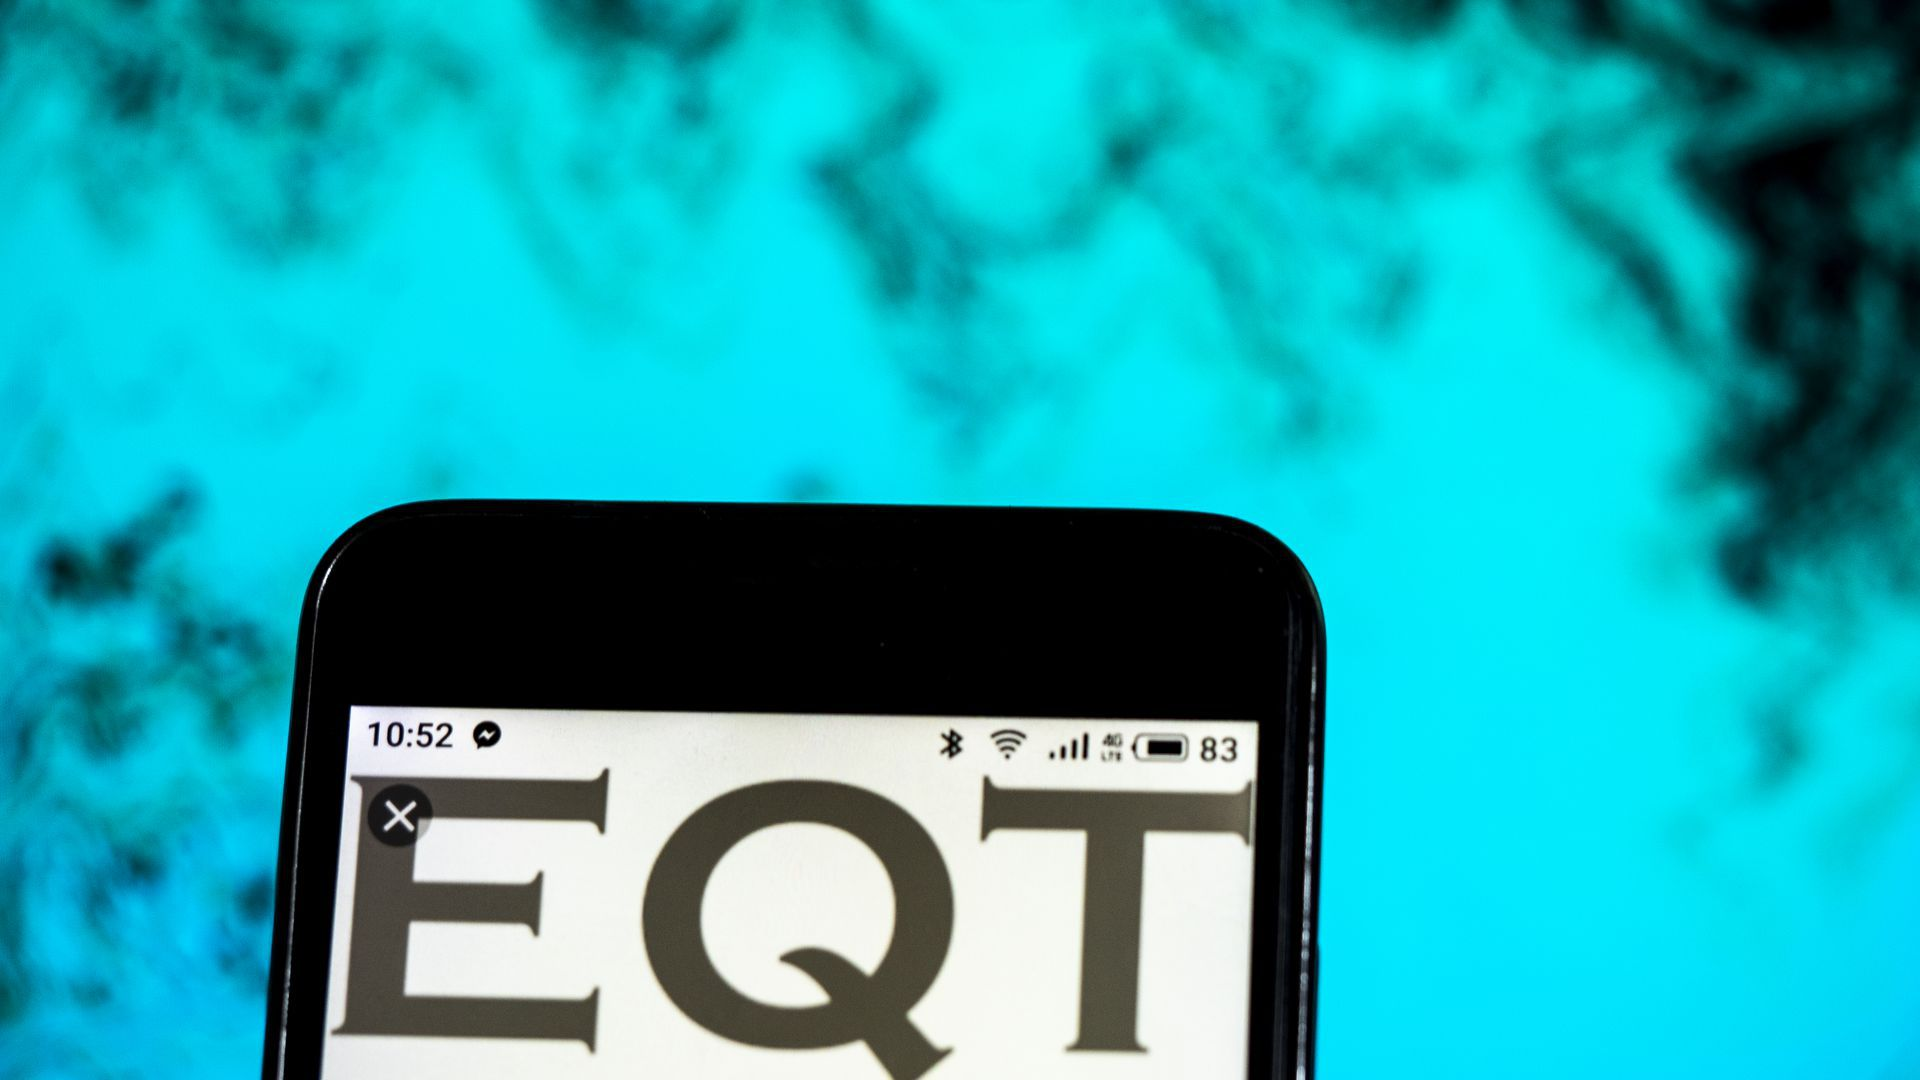 Phone that says EQT on it